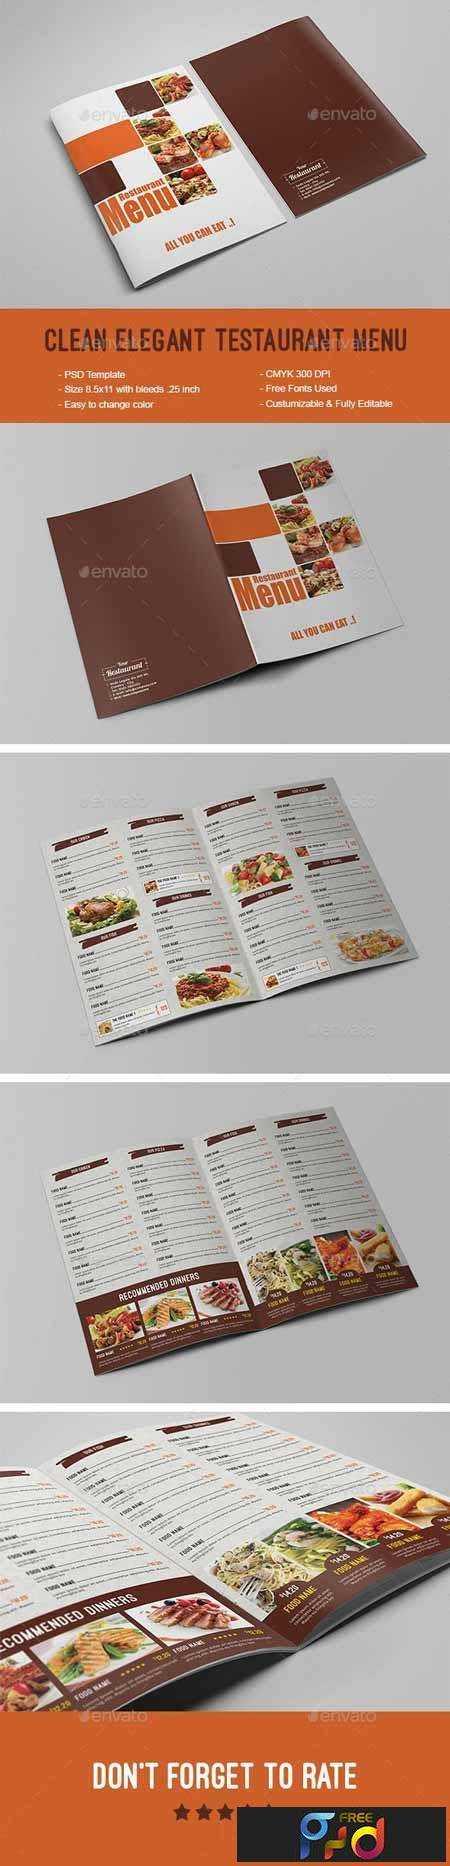 freepsdvn-com_1442851528_clean-elegant-restaurant-menu-12237092